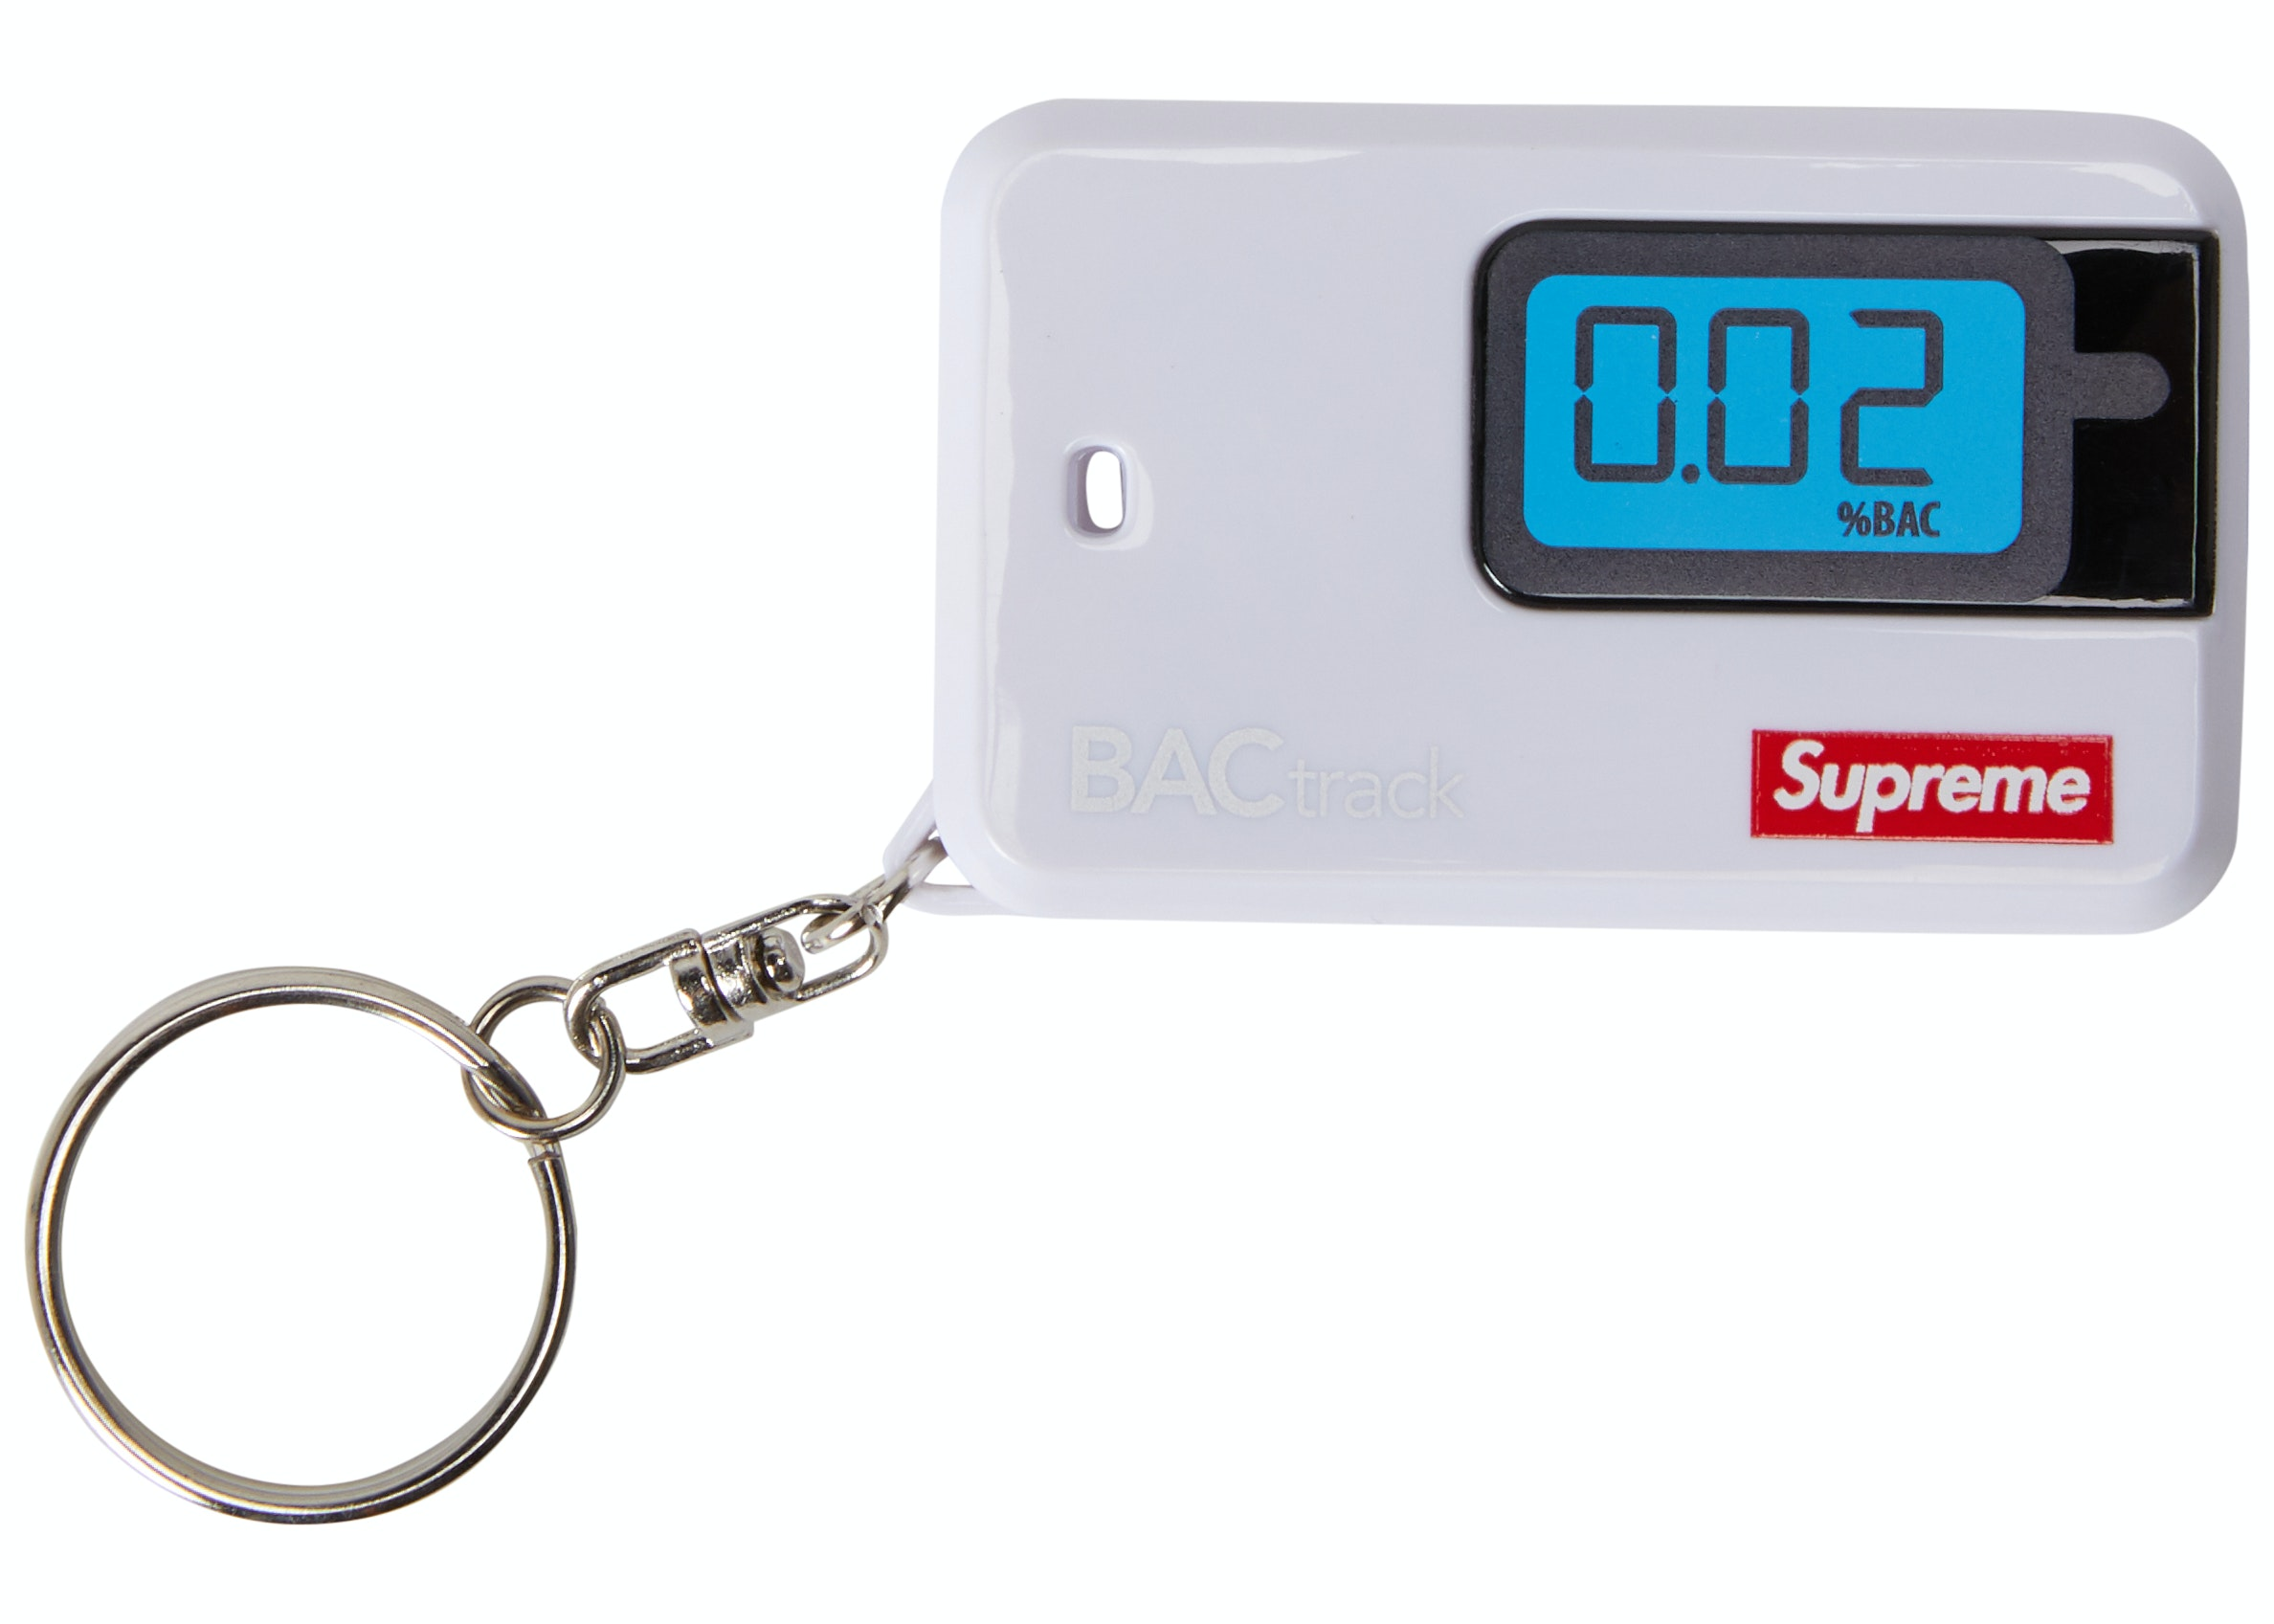 Supreme BACtrack Go Keychain White